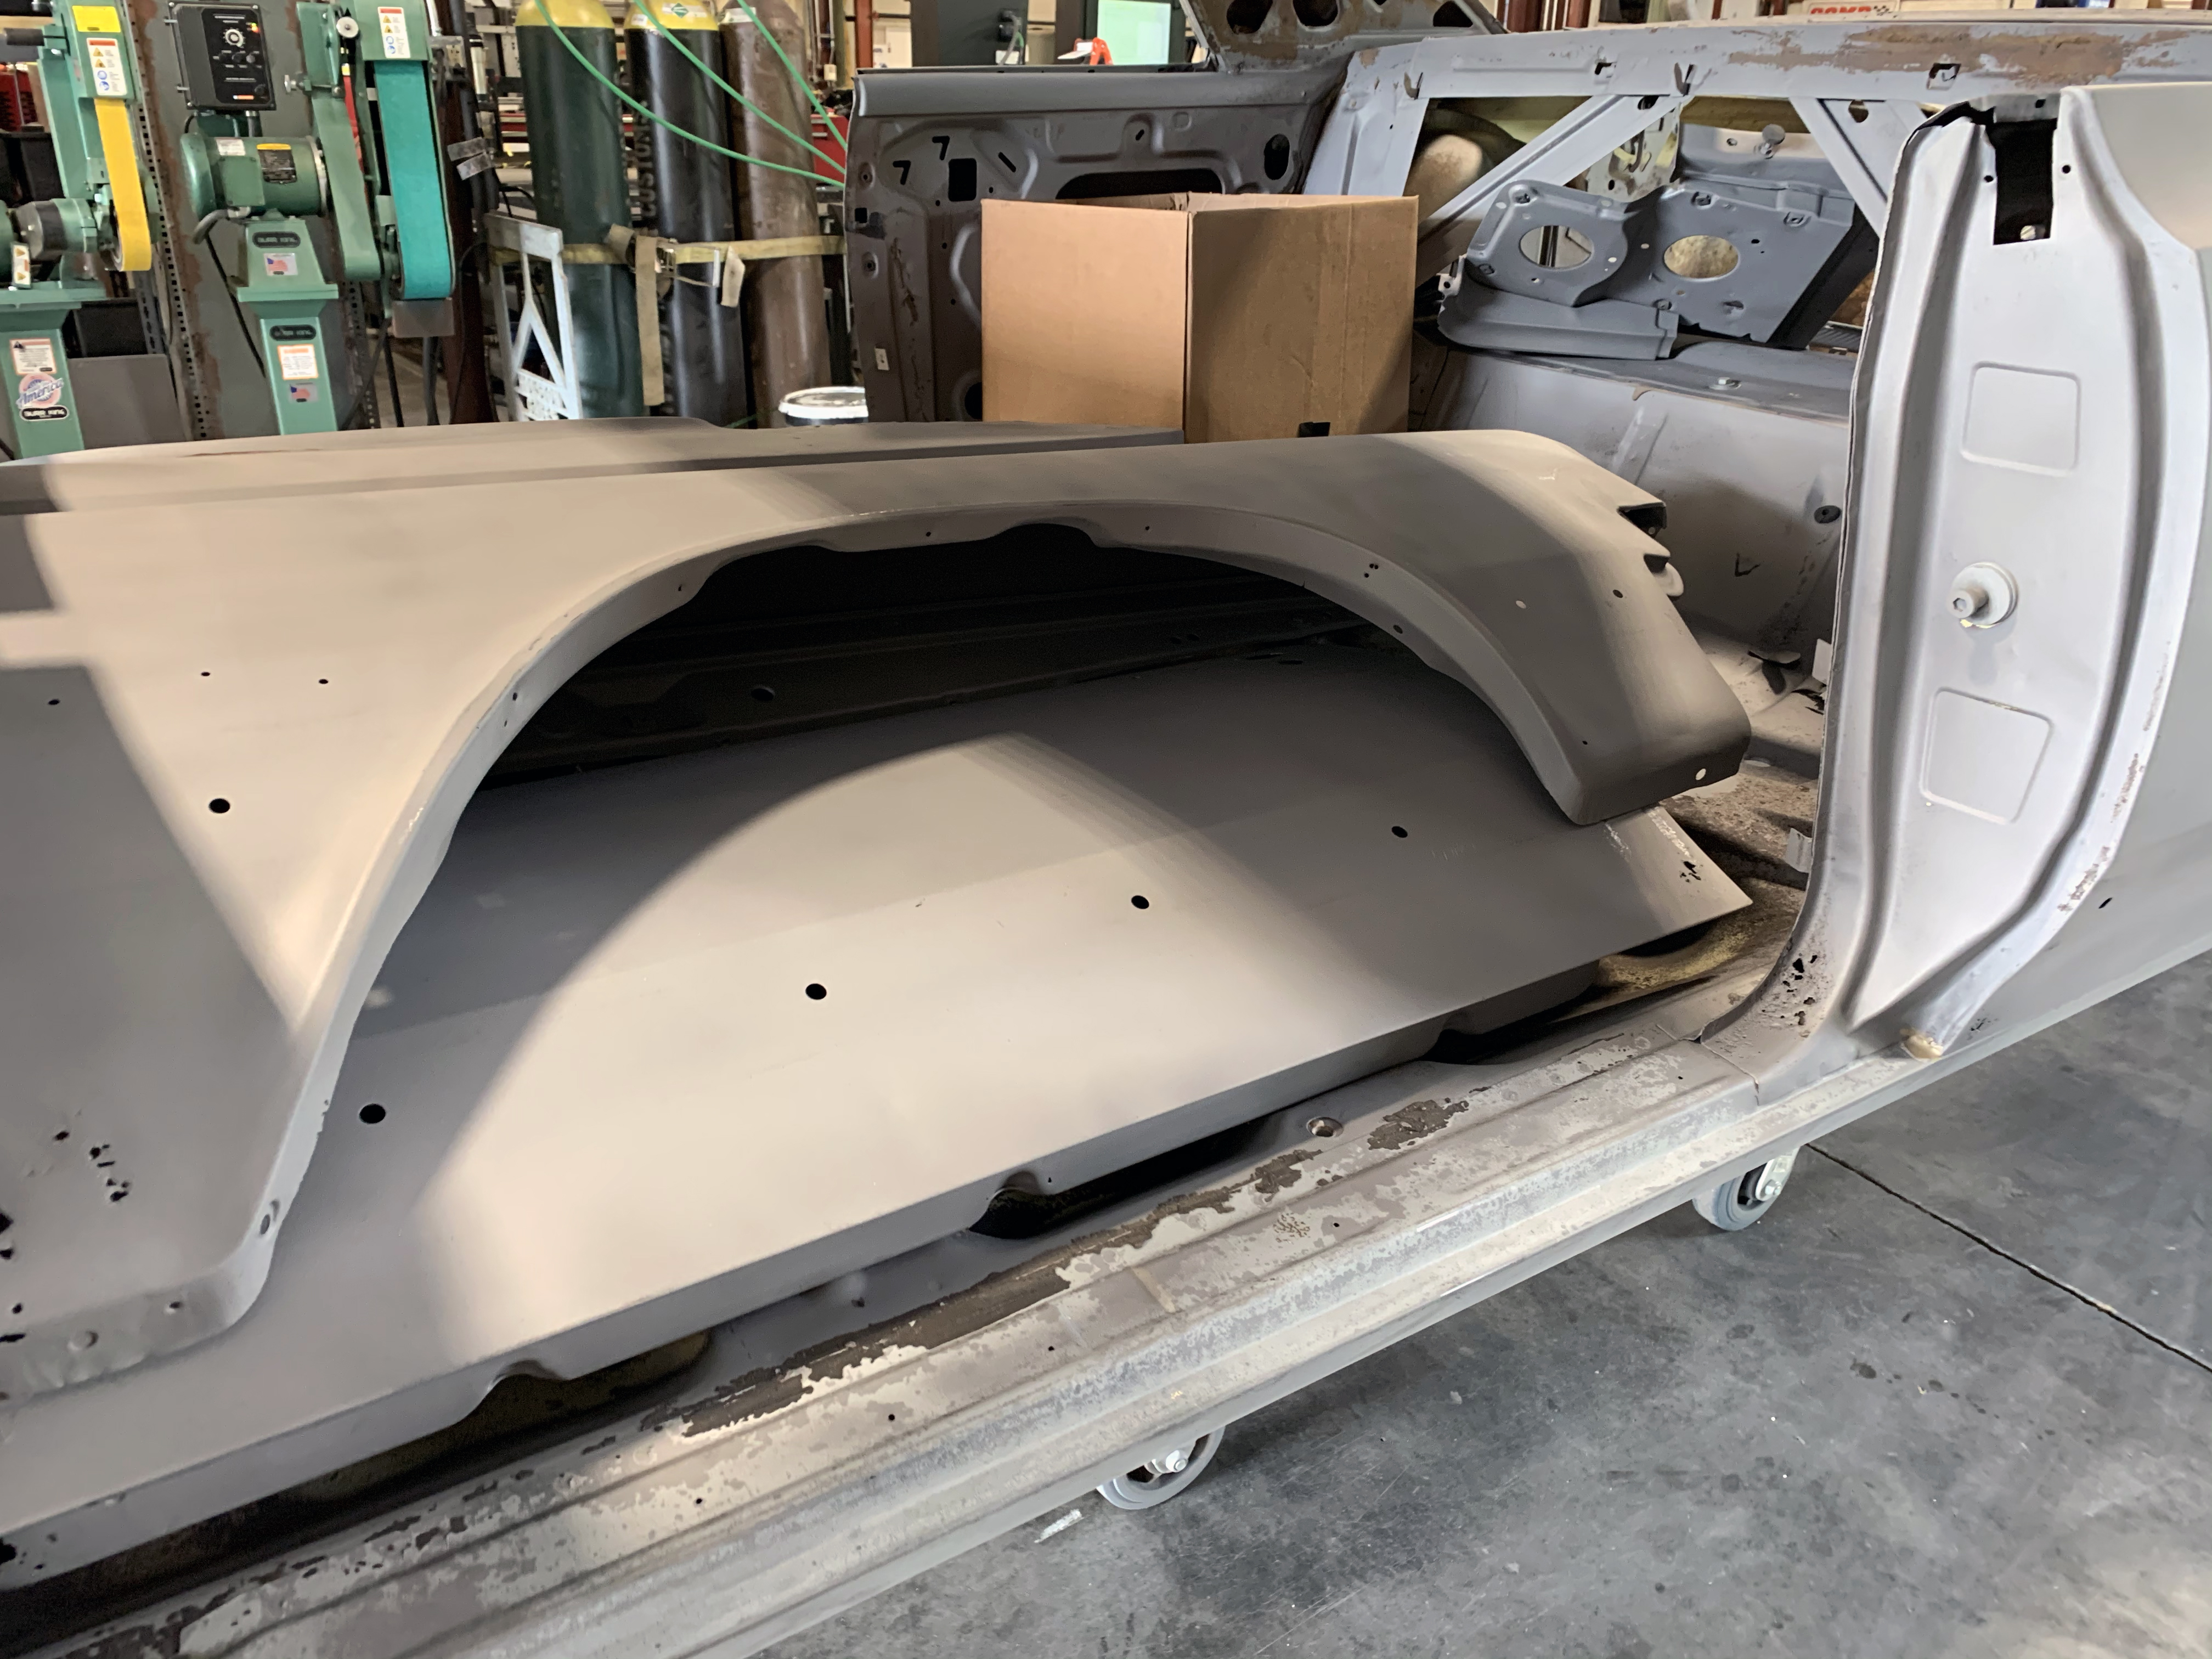 1_scotts-hotrods-65-cutlass-project-10